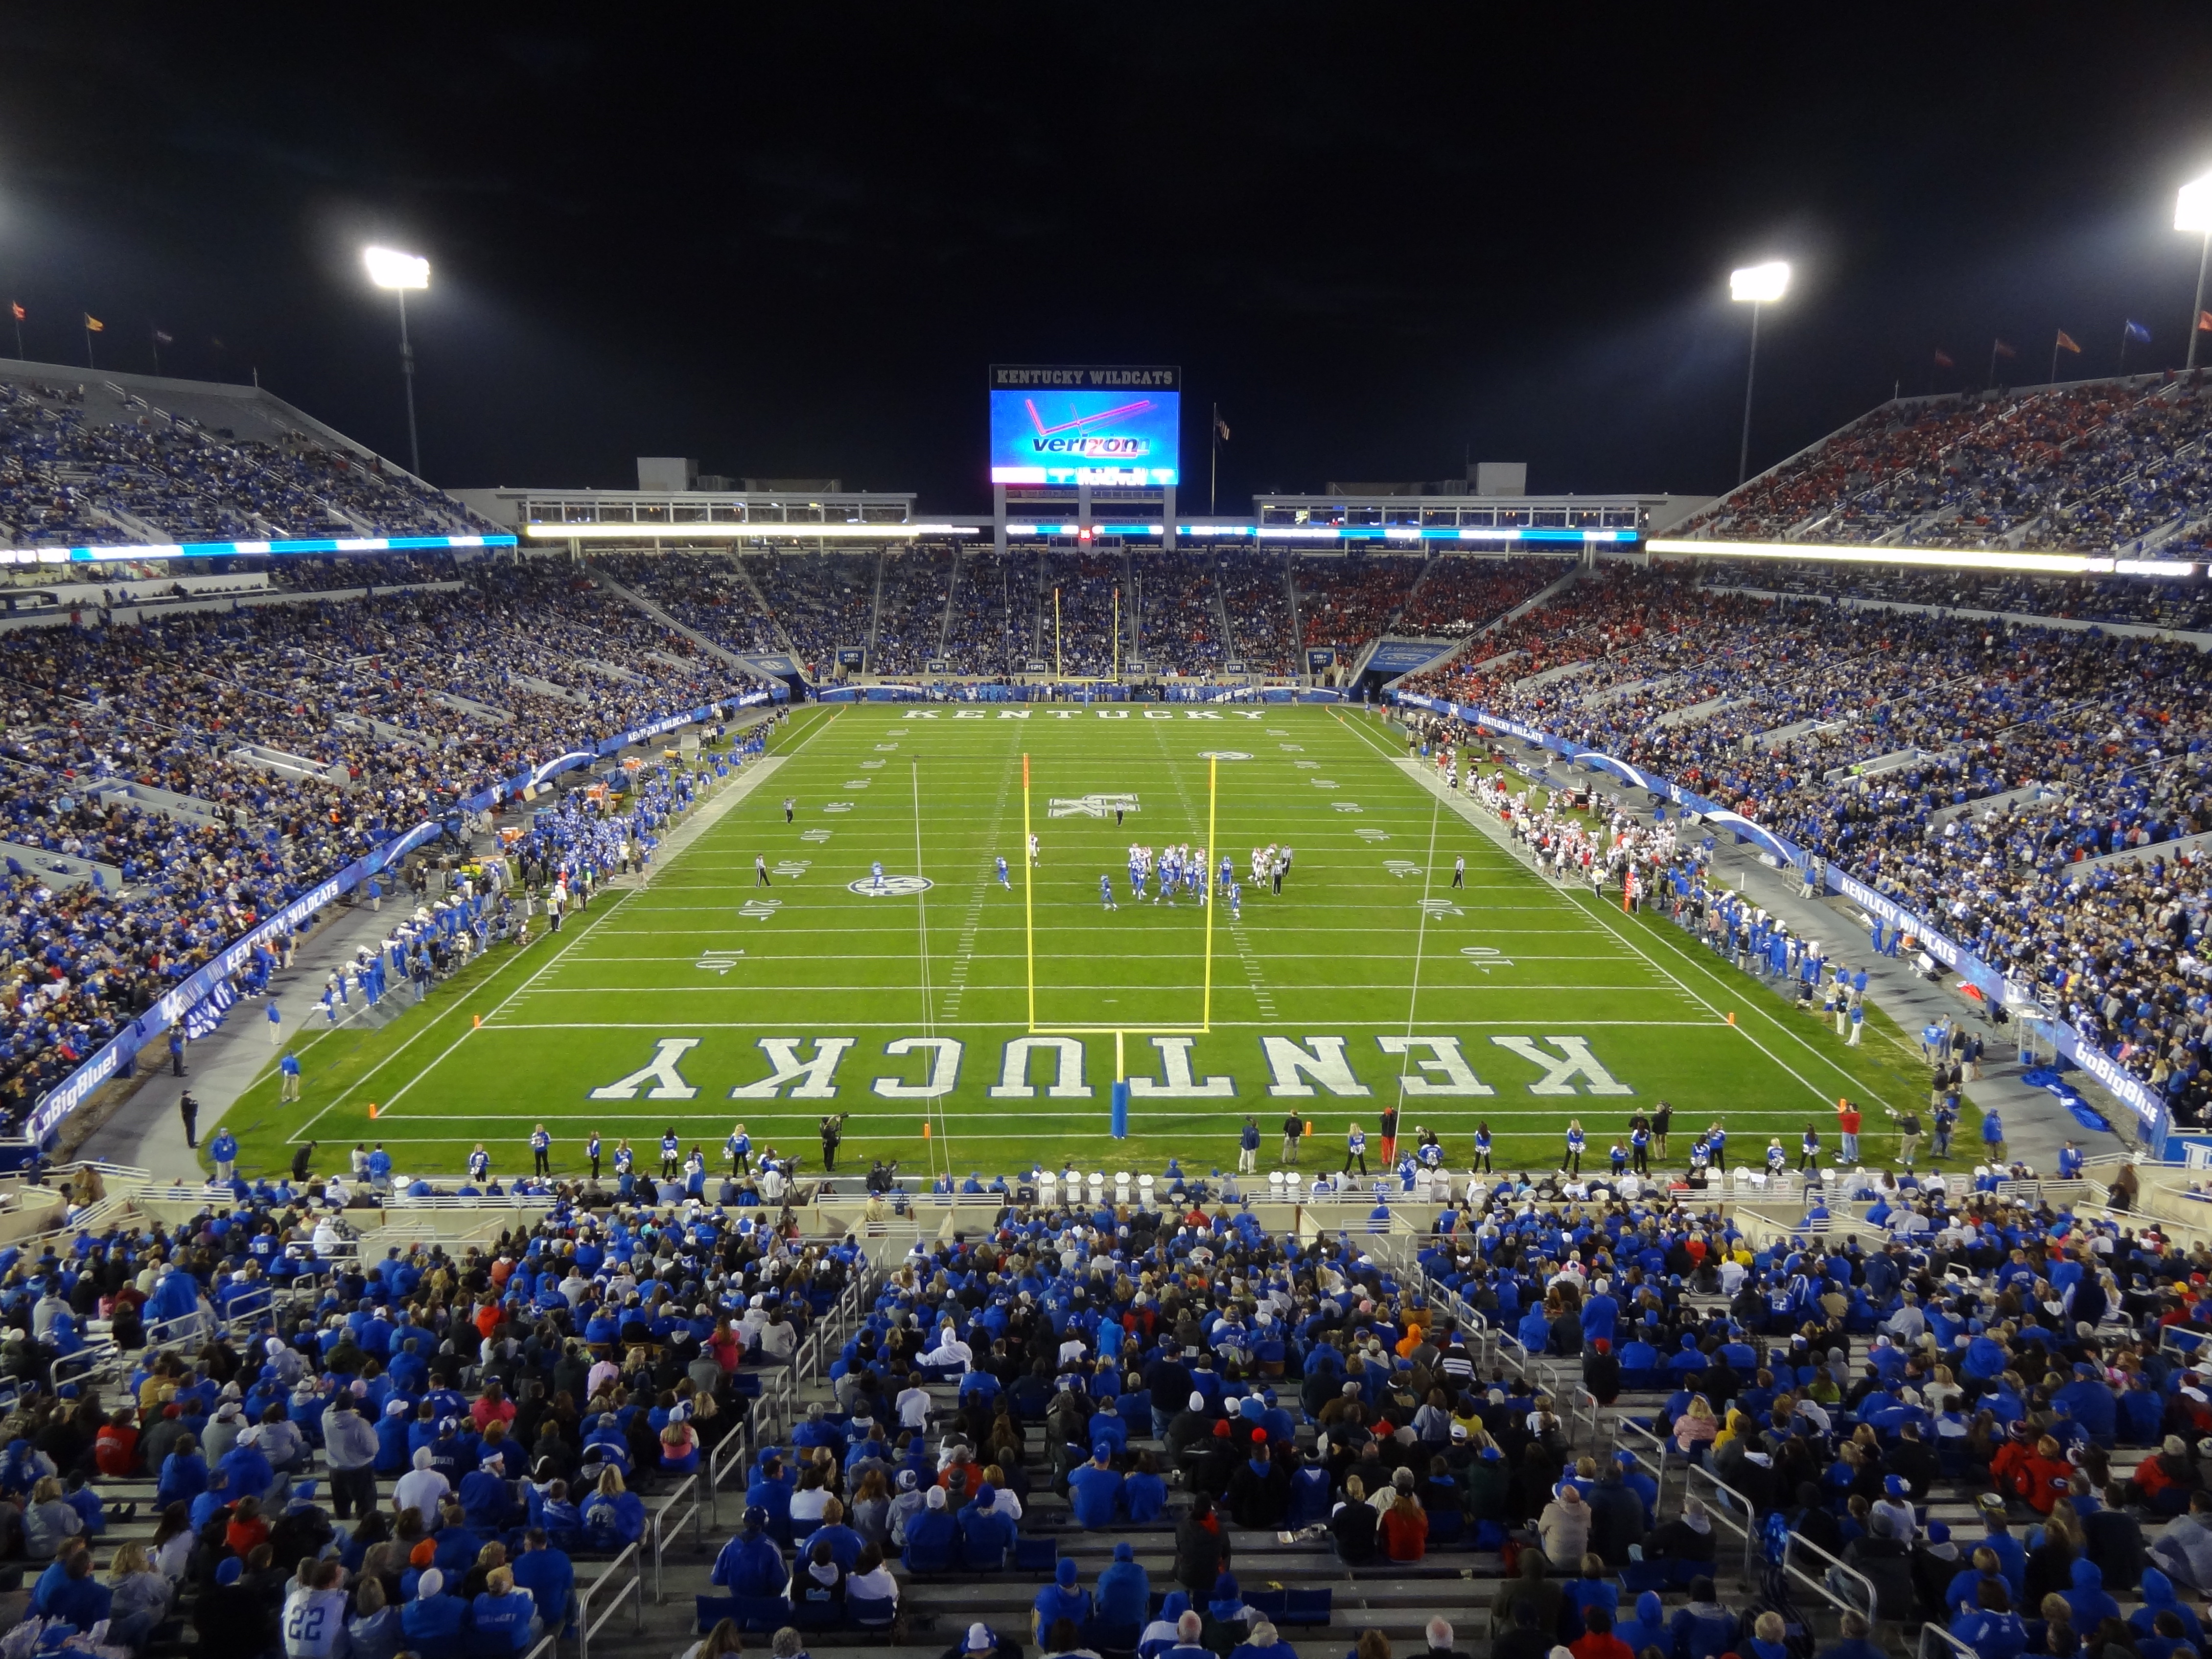 Tennessee Volunteers Football Seating Chart Seating Chart | SeatGeek